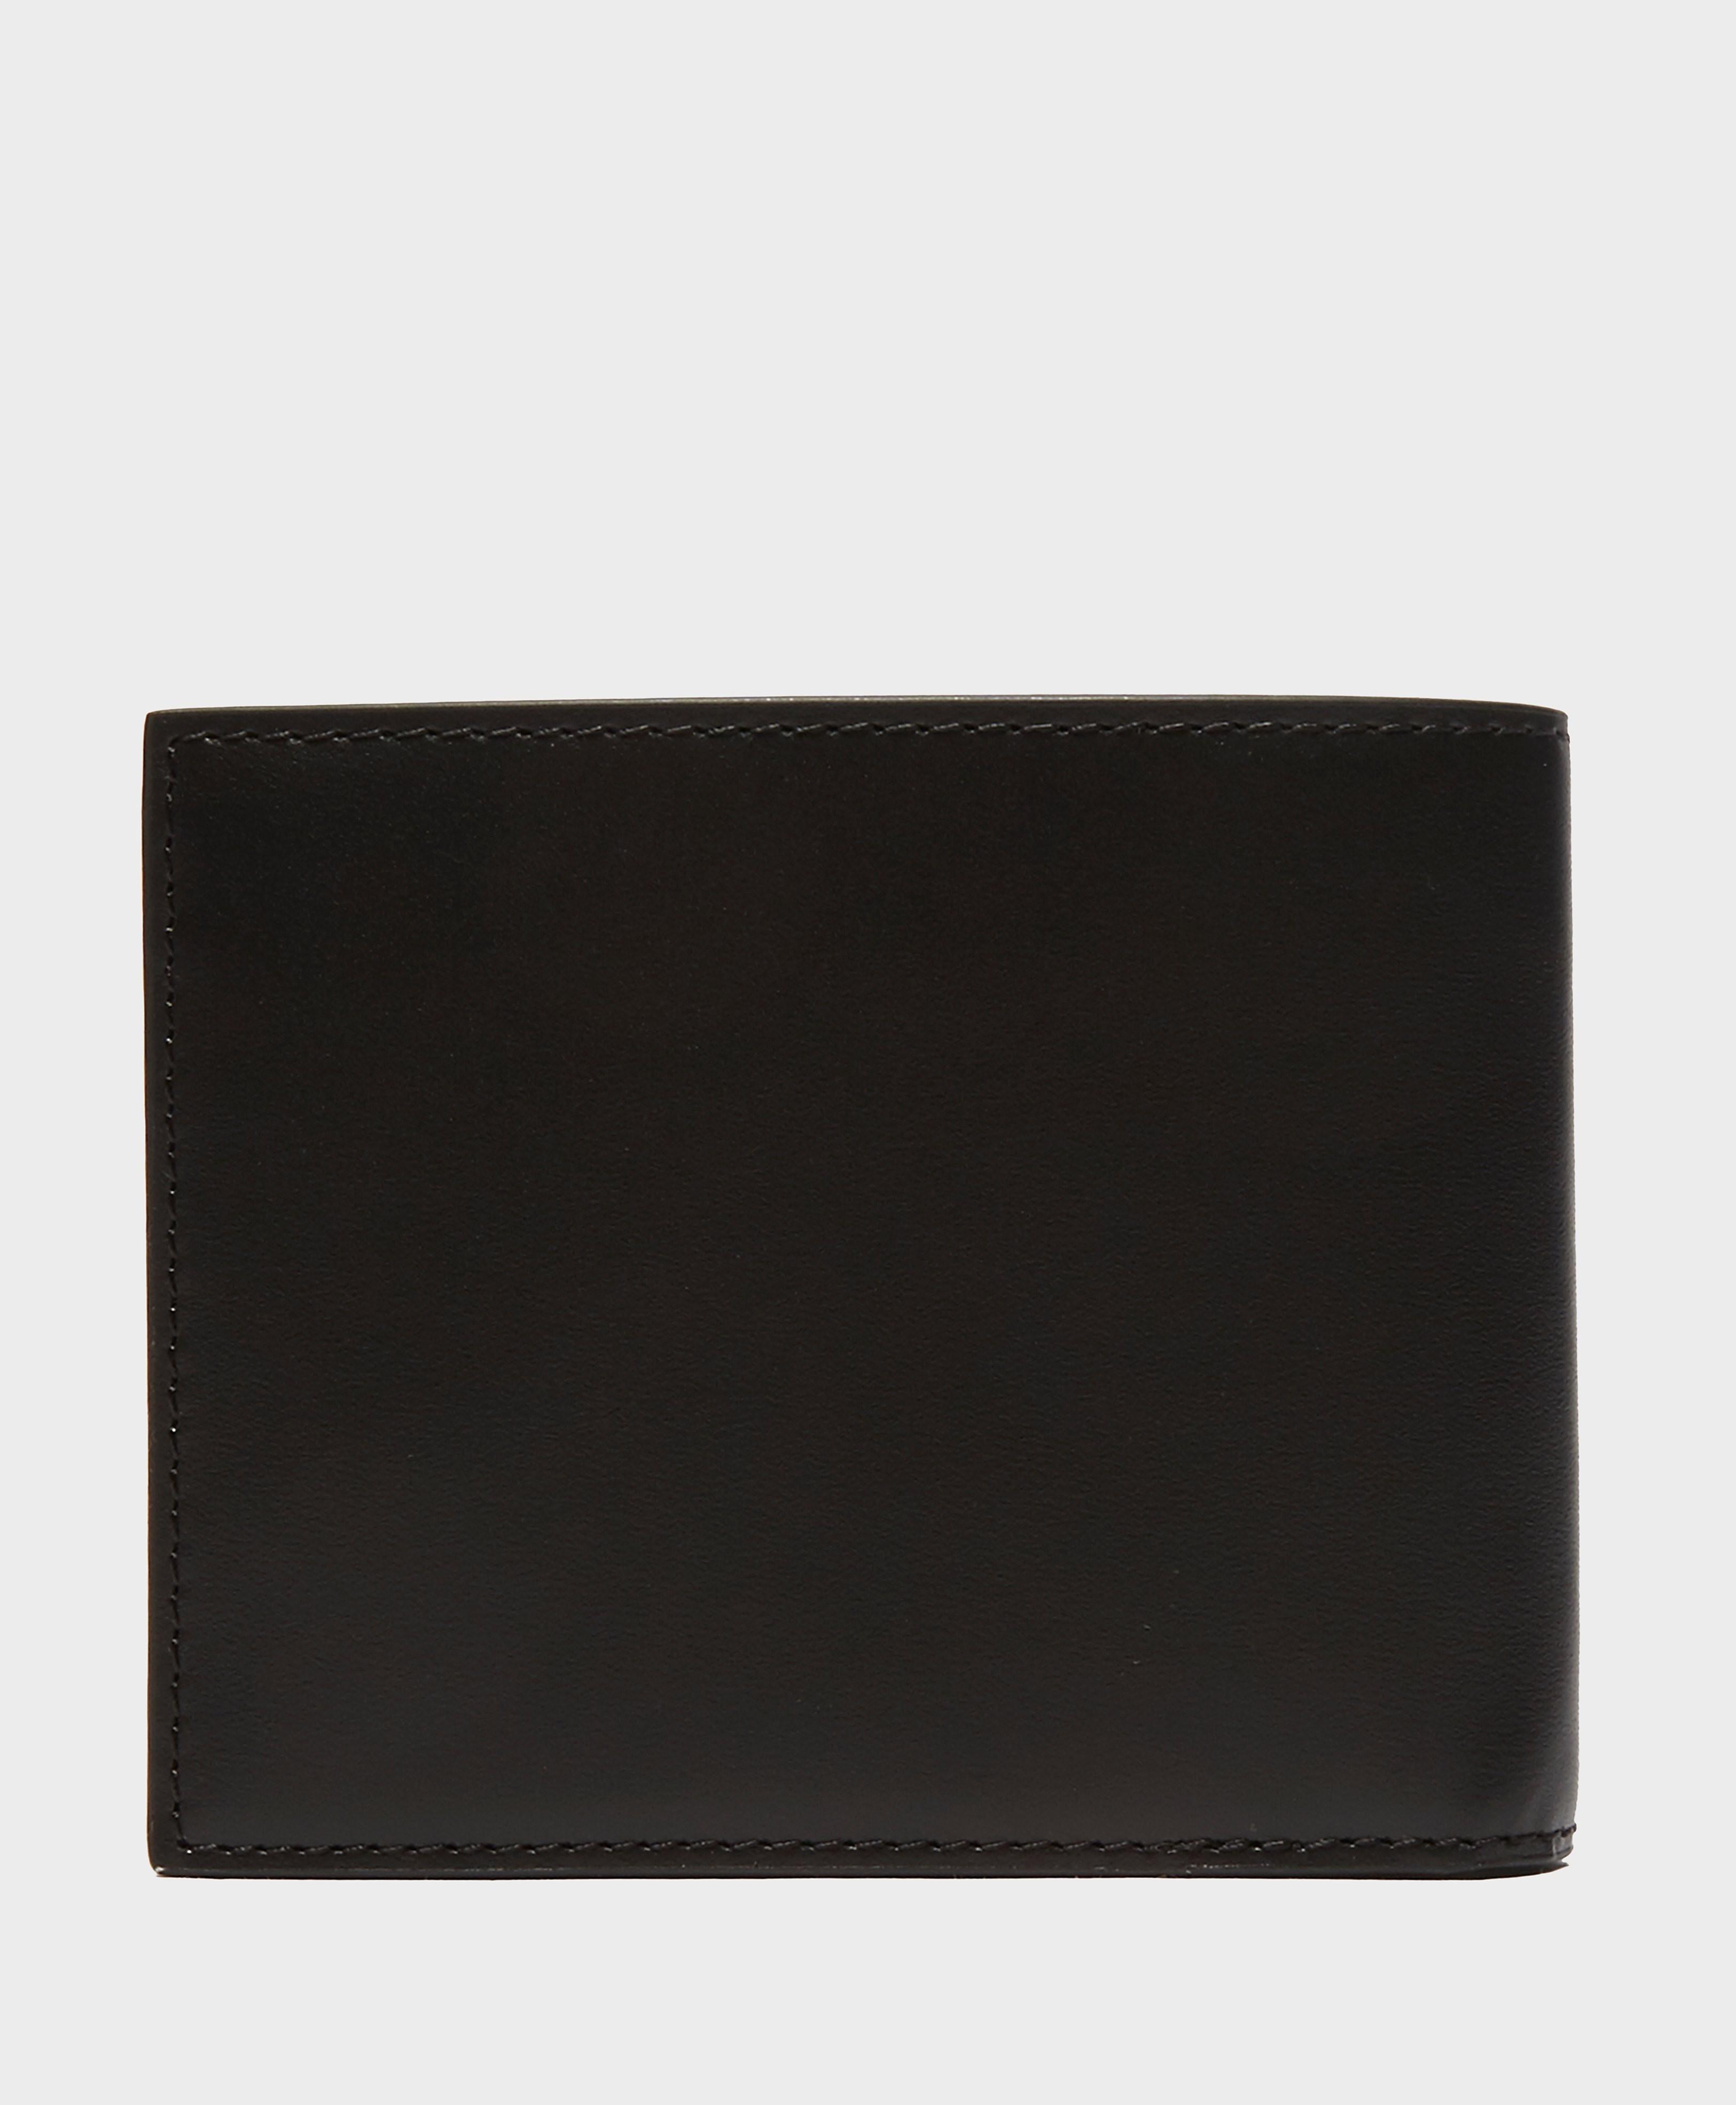 Lacoste Croc Wallet